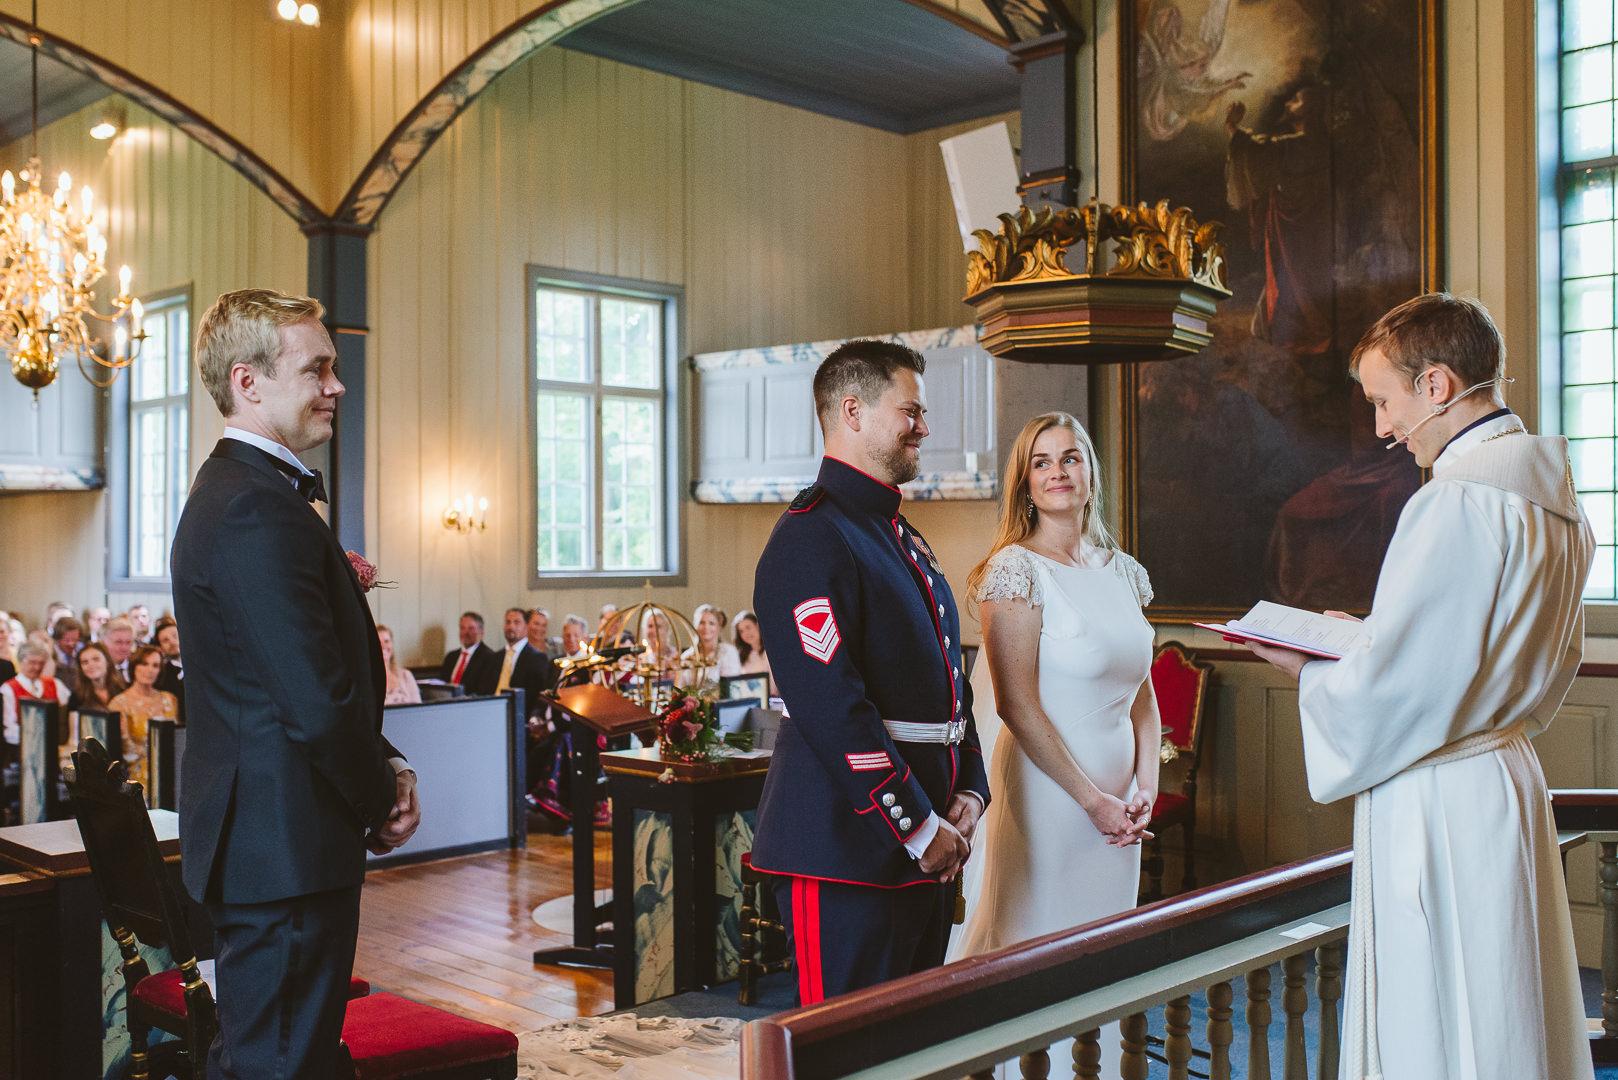 Norwegian Wedding - From my best wedding photos from 2019